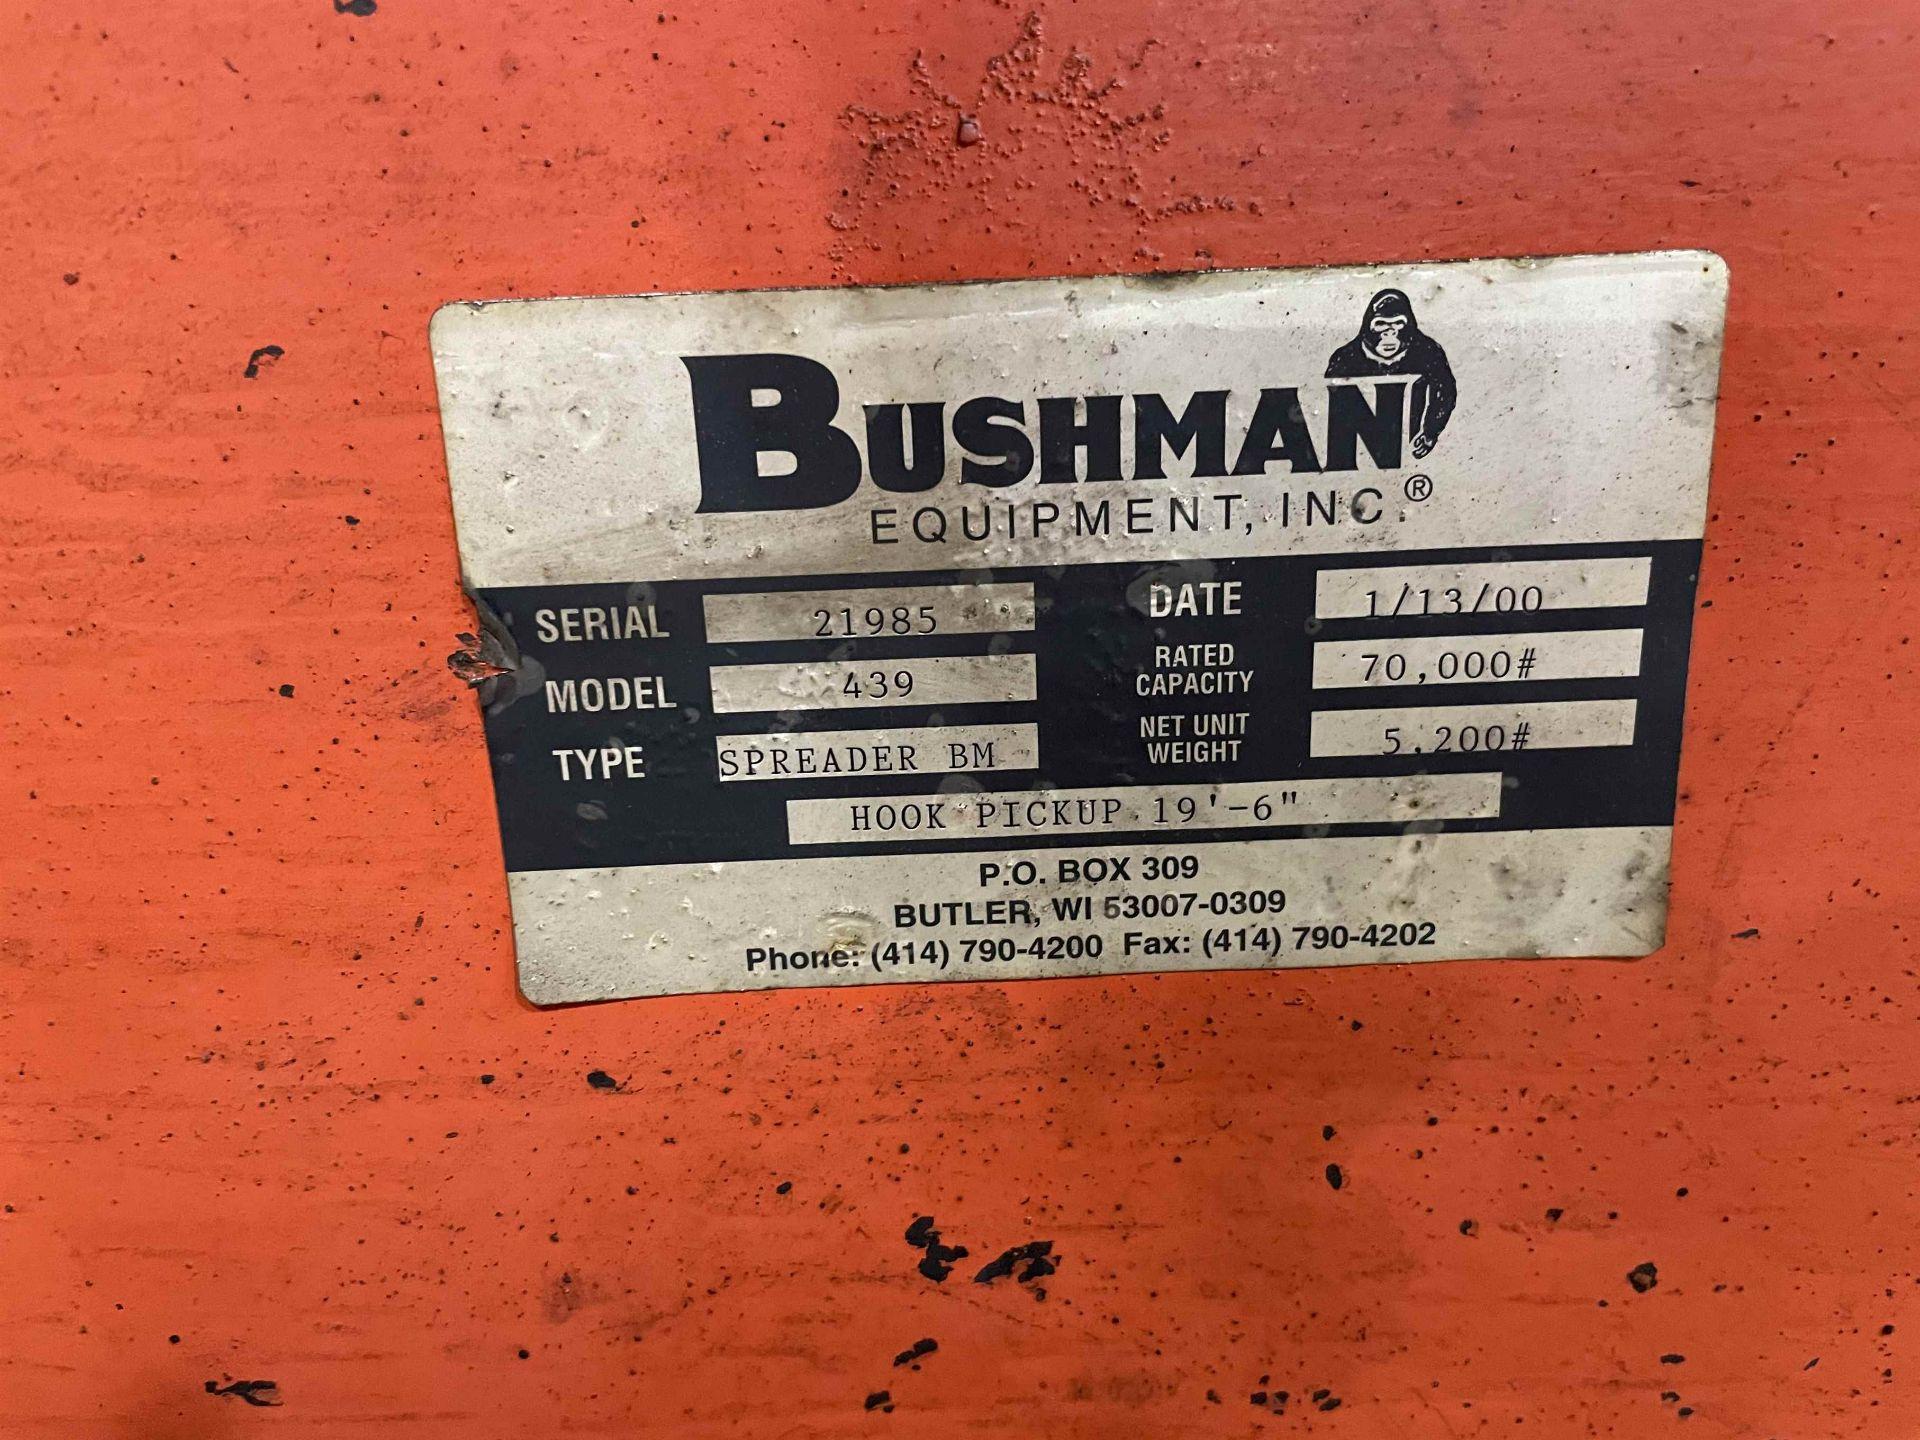 2000 BUSHMAN 439 35-Ton Spreader Beam, s/n 21985, 20'L - Image 3 of 3